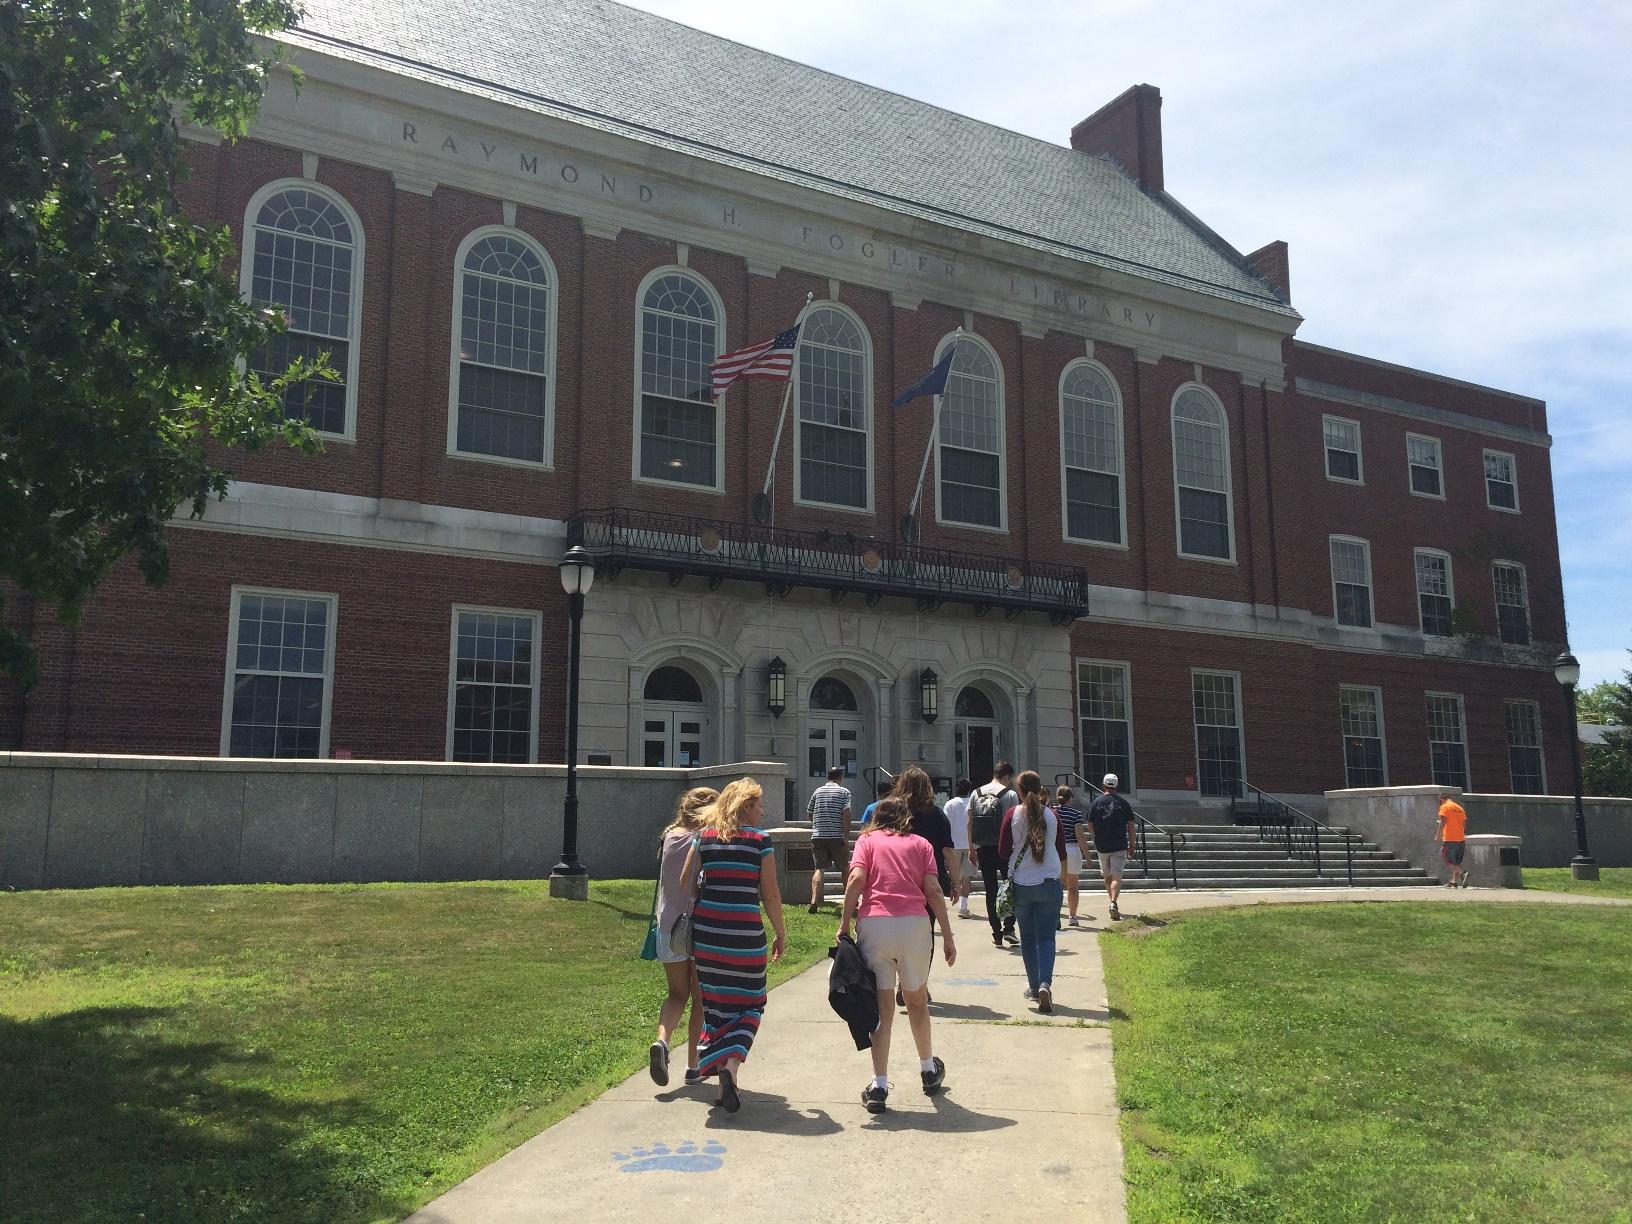 The University of Maine